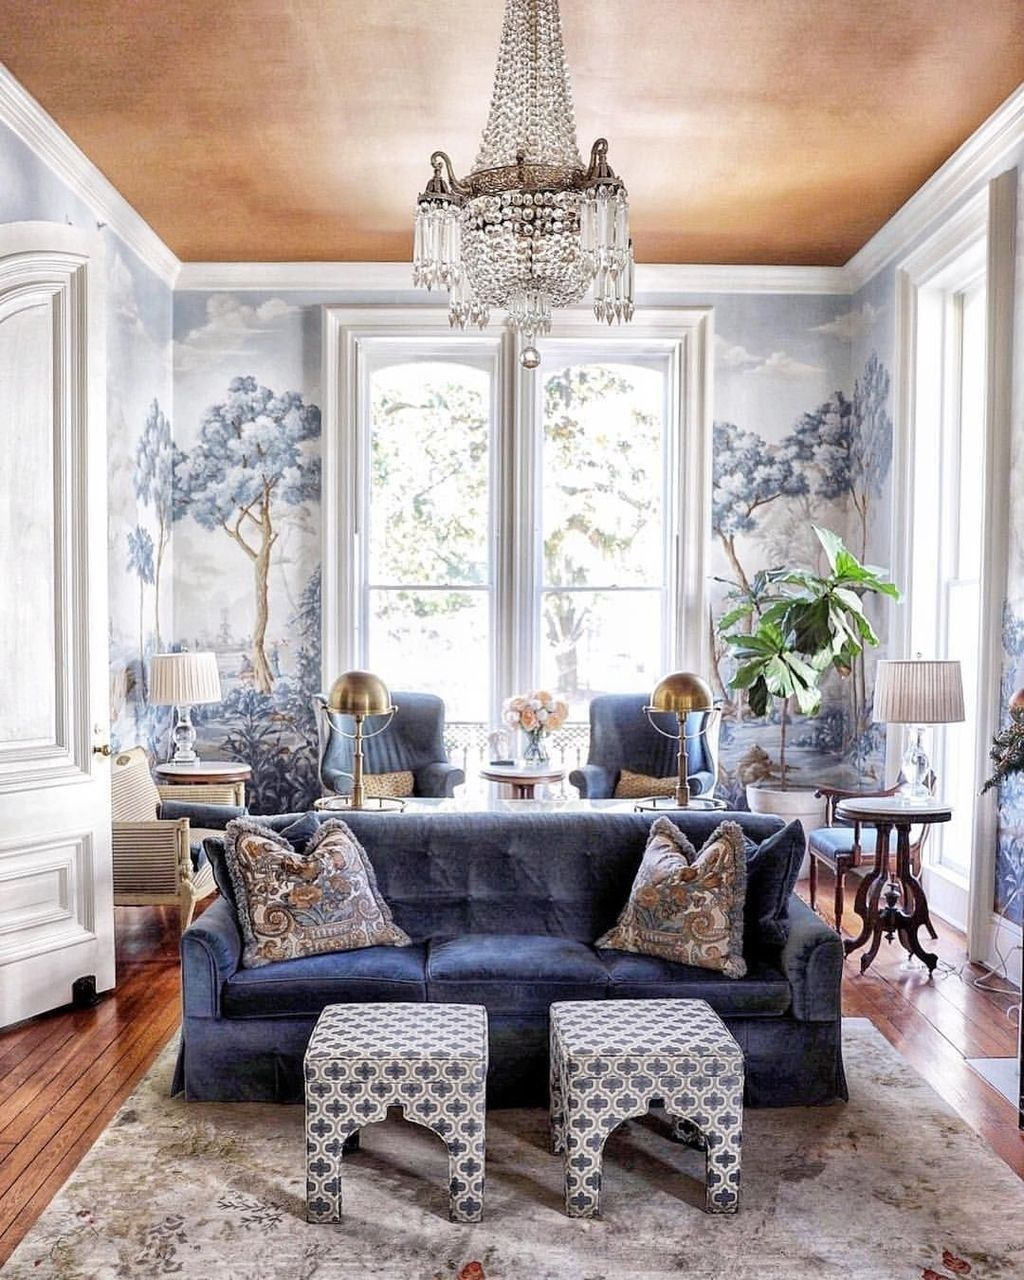 40 awesome emphasis interior design ideas transitional on home interior design ideas id=60209